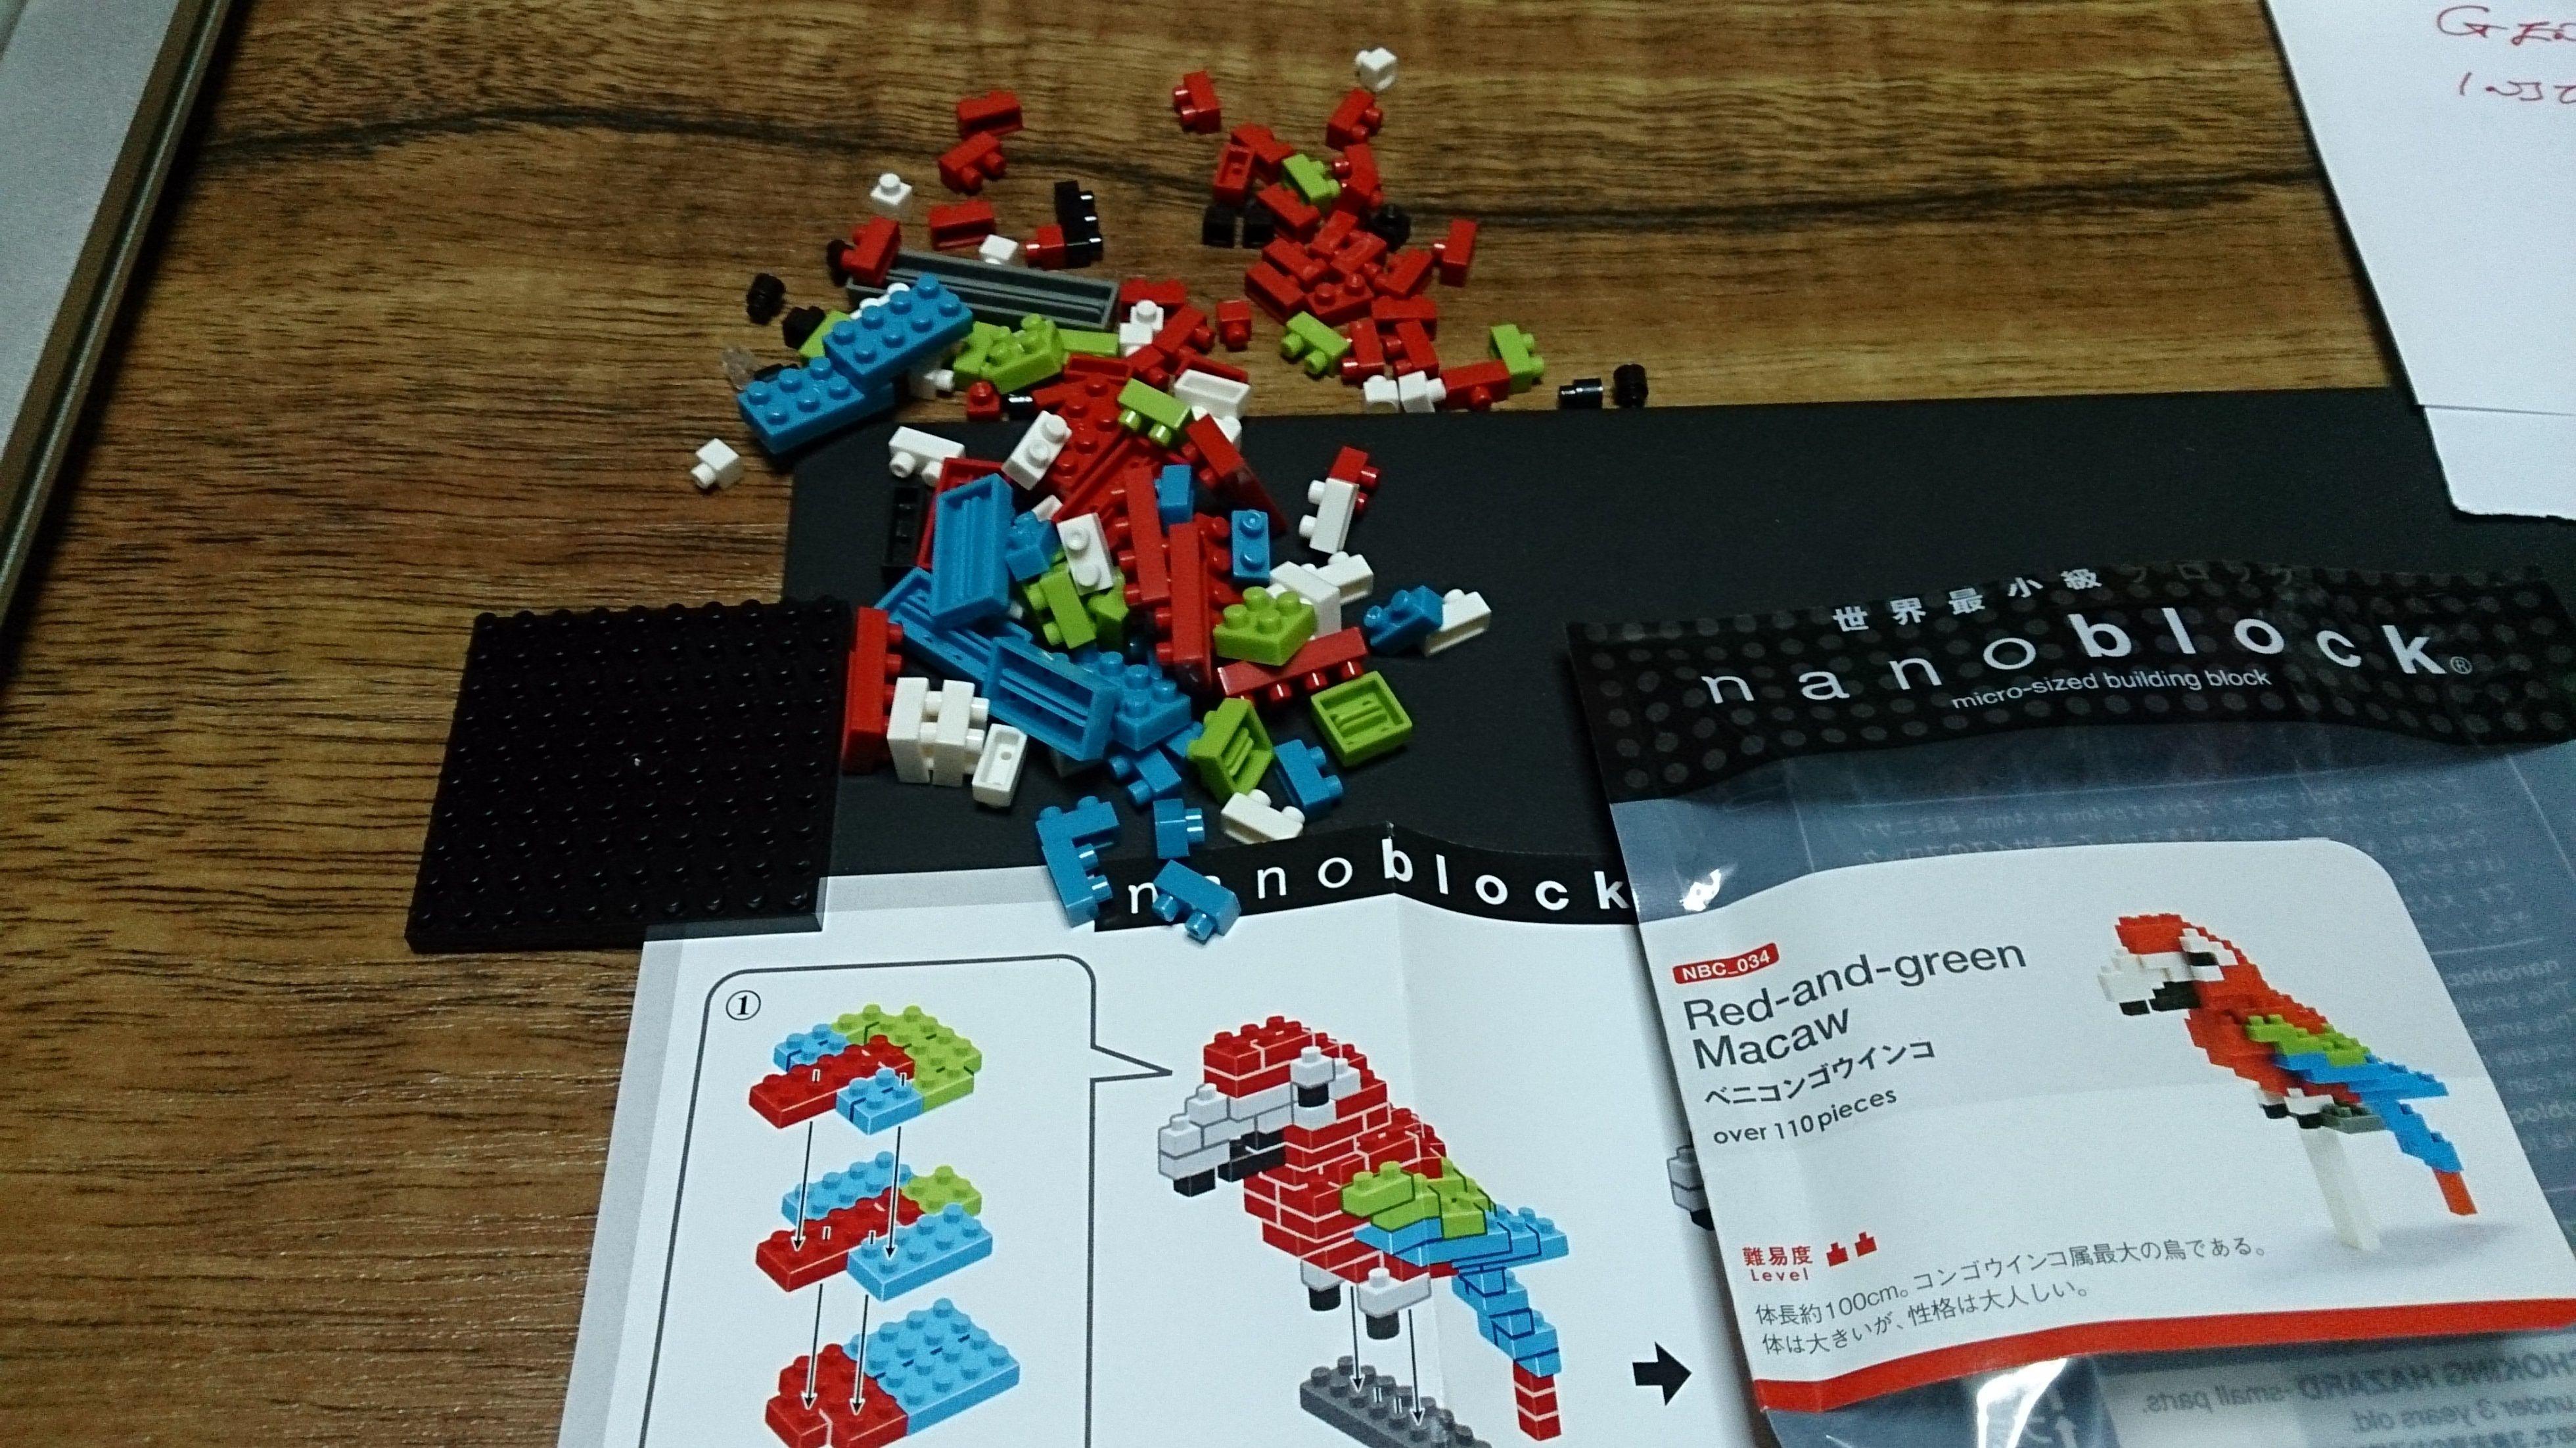 Nanoblock Red /& Green Macaw Building Kit 110 Pcs NBC.034 In stock